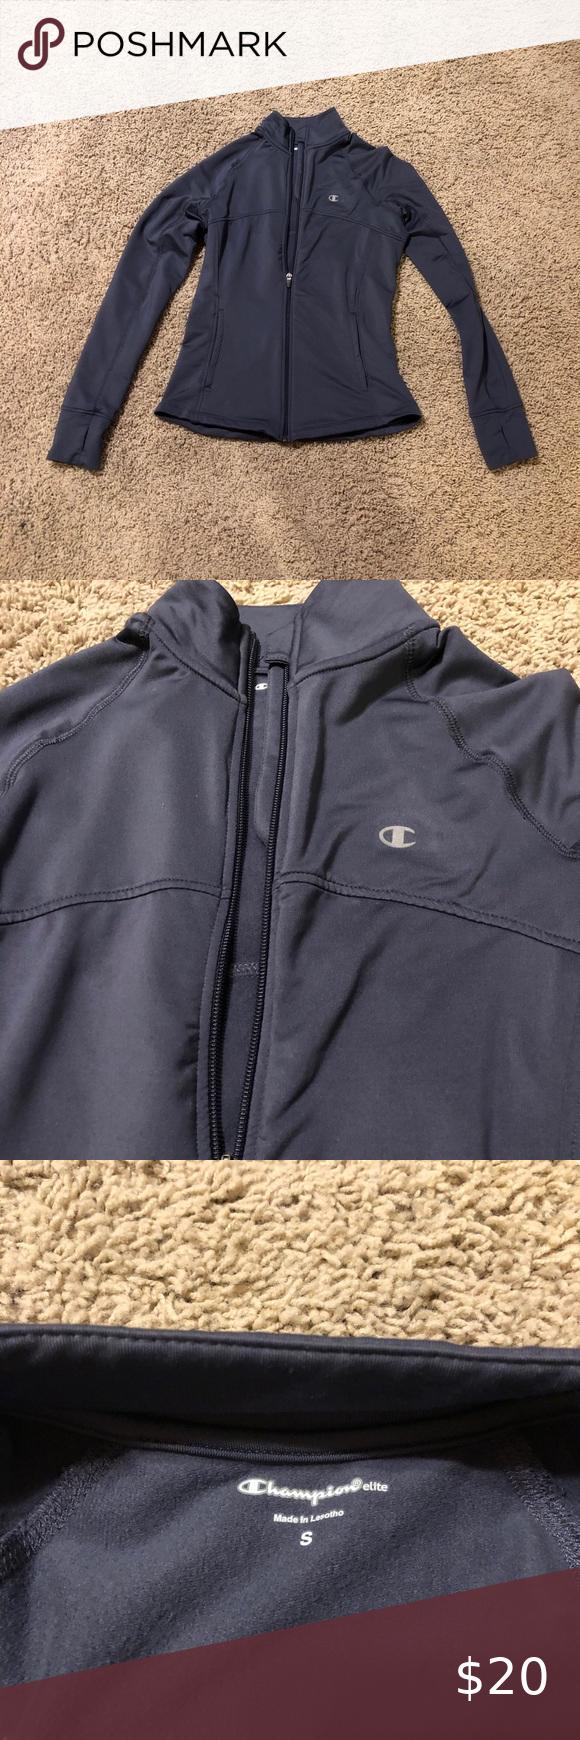 Champion Elite Jacket Small Coats Jackets Women Grey Champion Hoodie Quarter Zip Jacket [ 1740 x 580 Pixel ]